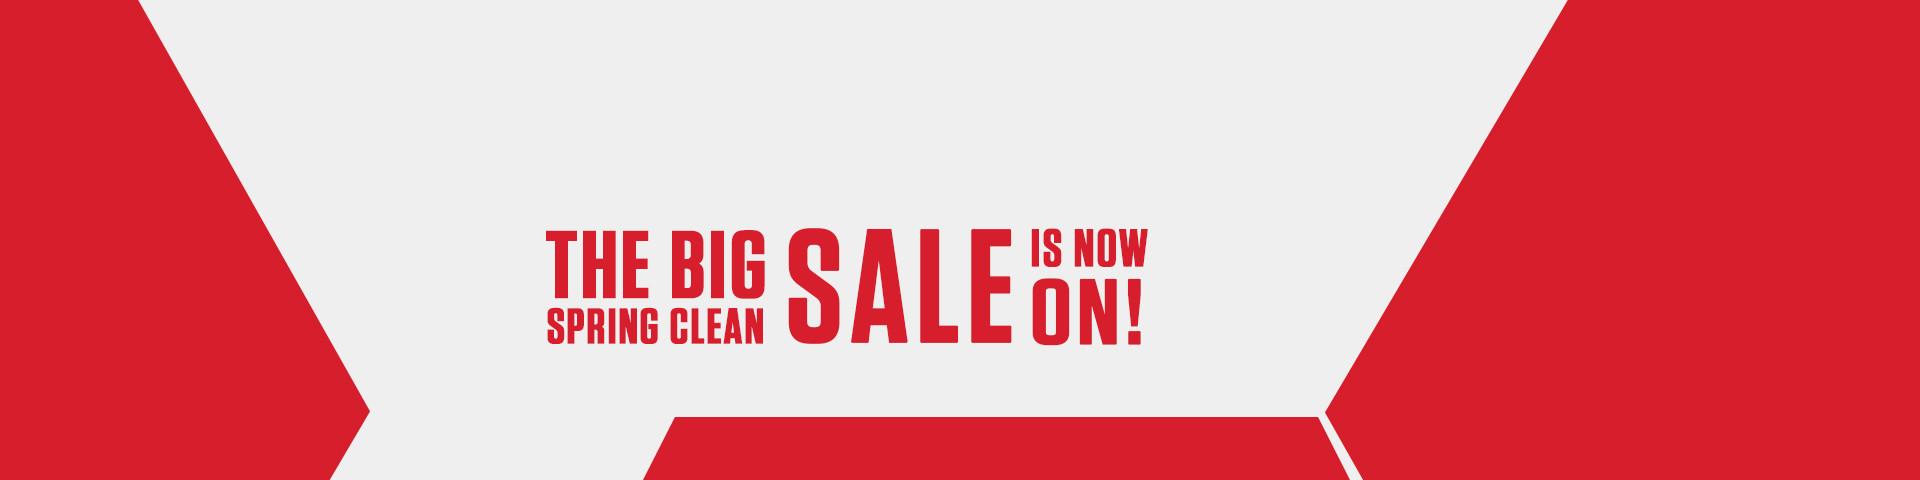 The Big Spring Clean Sale